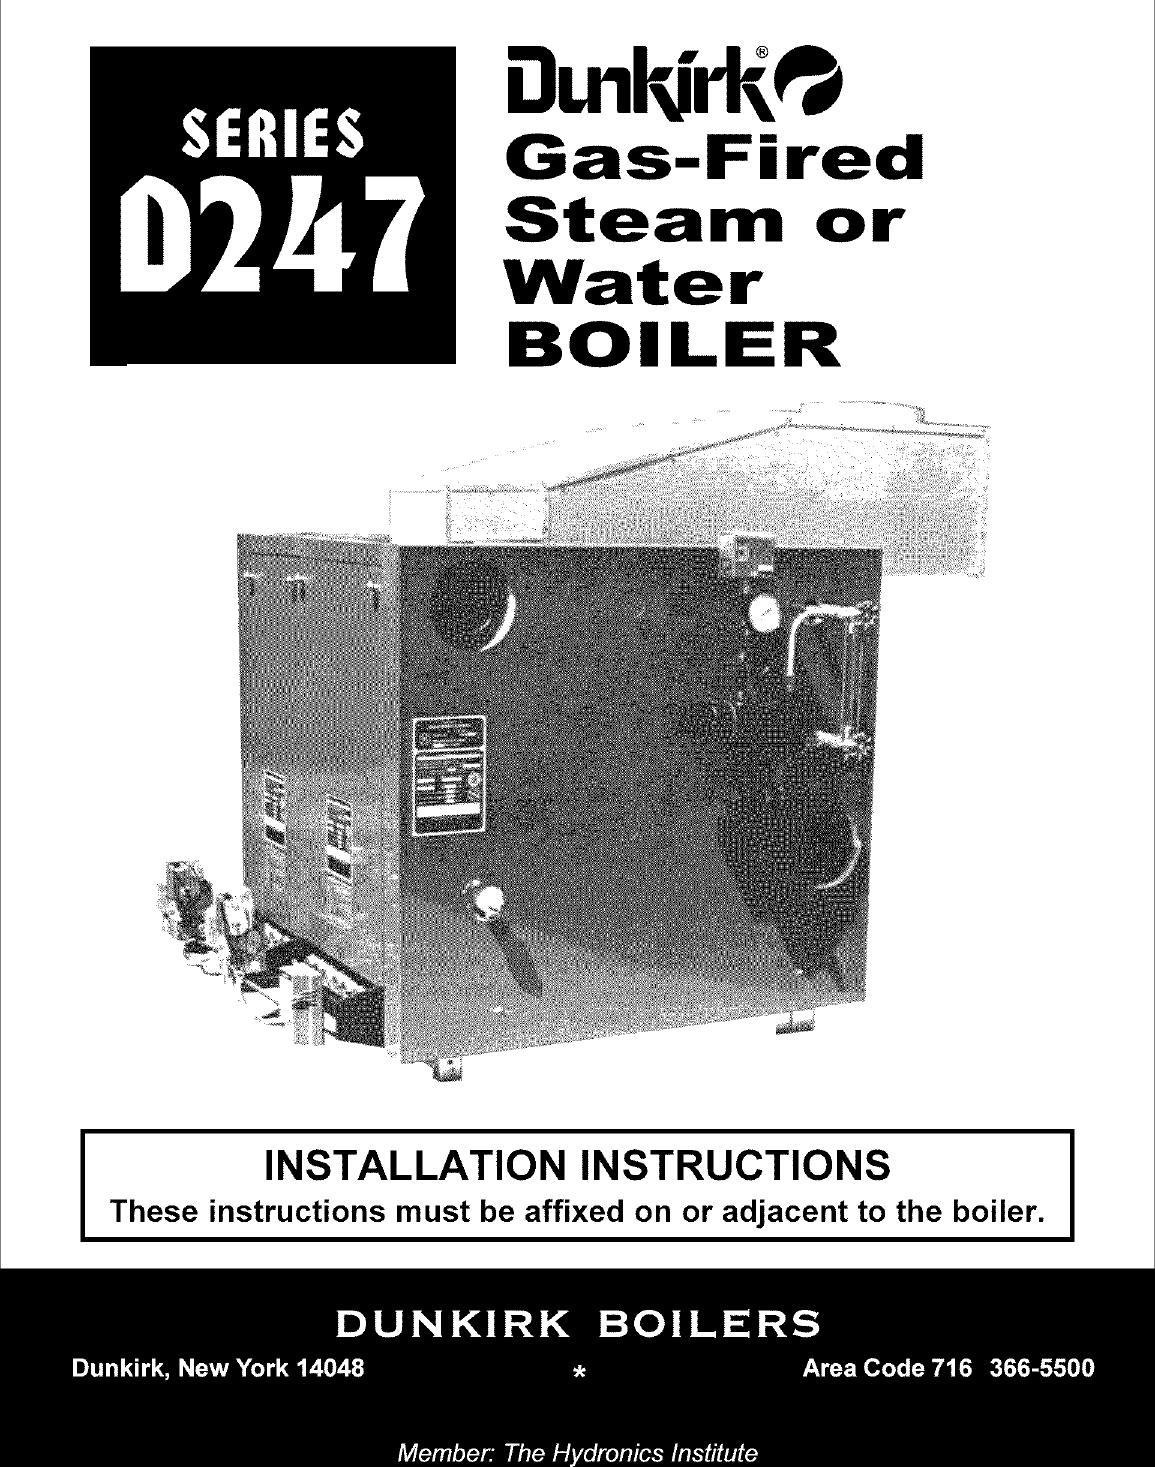 DUNKIRK Boiler Manual L0611128 on fireplace wiring diagram, tekmar wiring diagram, central heating wiring diagram, bell and gossett wiring diagram,